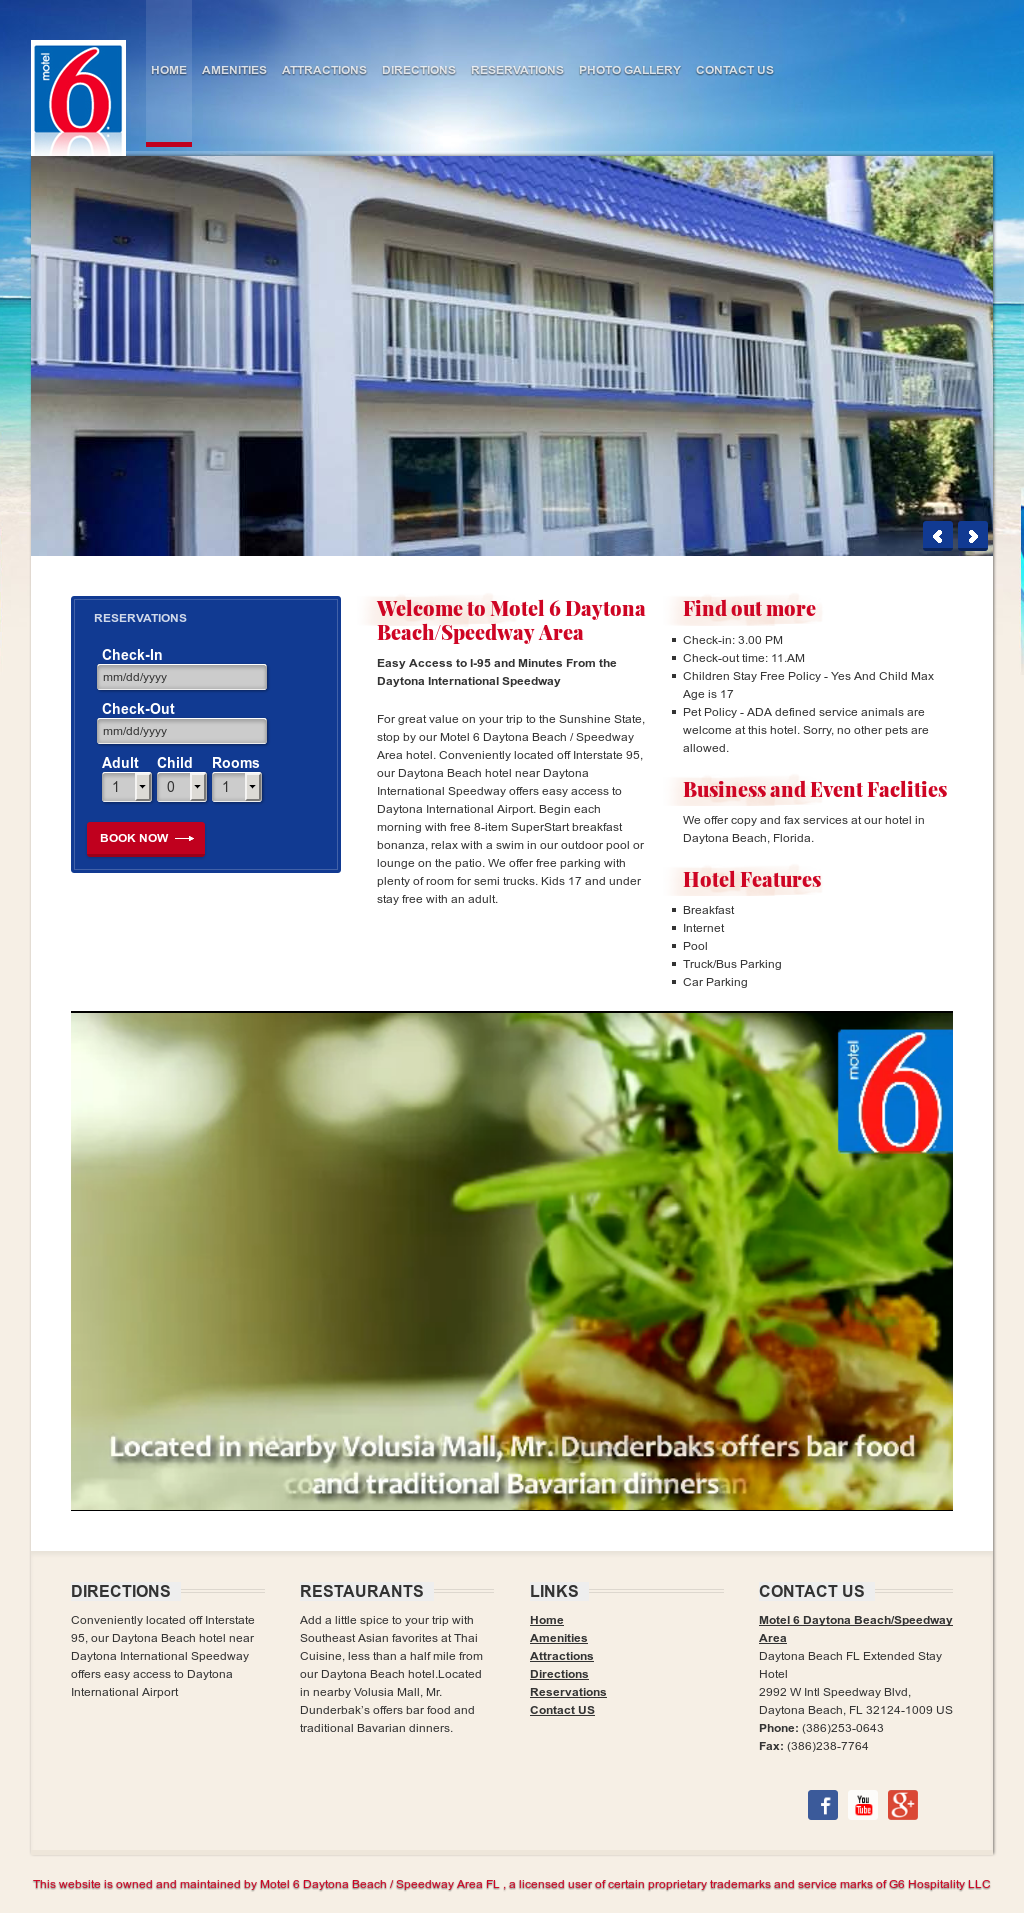 Motel 6 Daytona Beach / Speedway Area Hotel Competitors, Revenue and ...